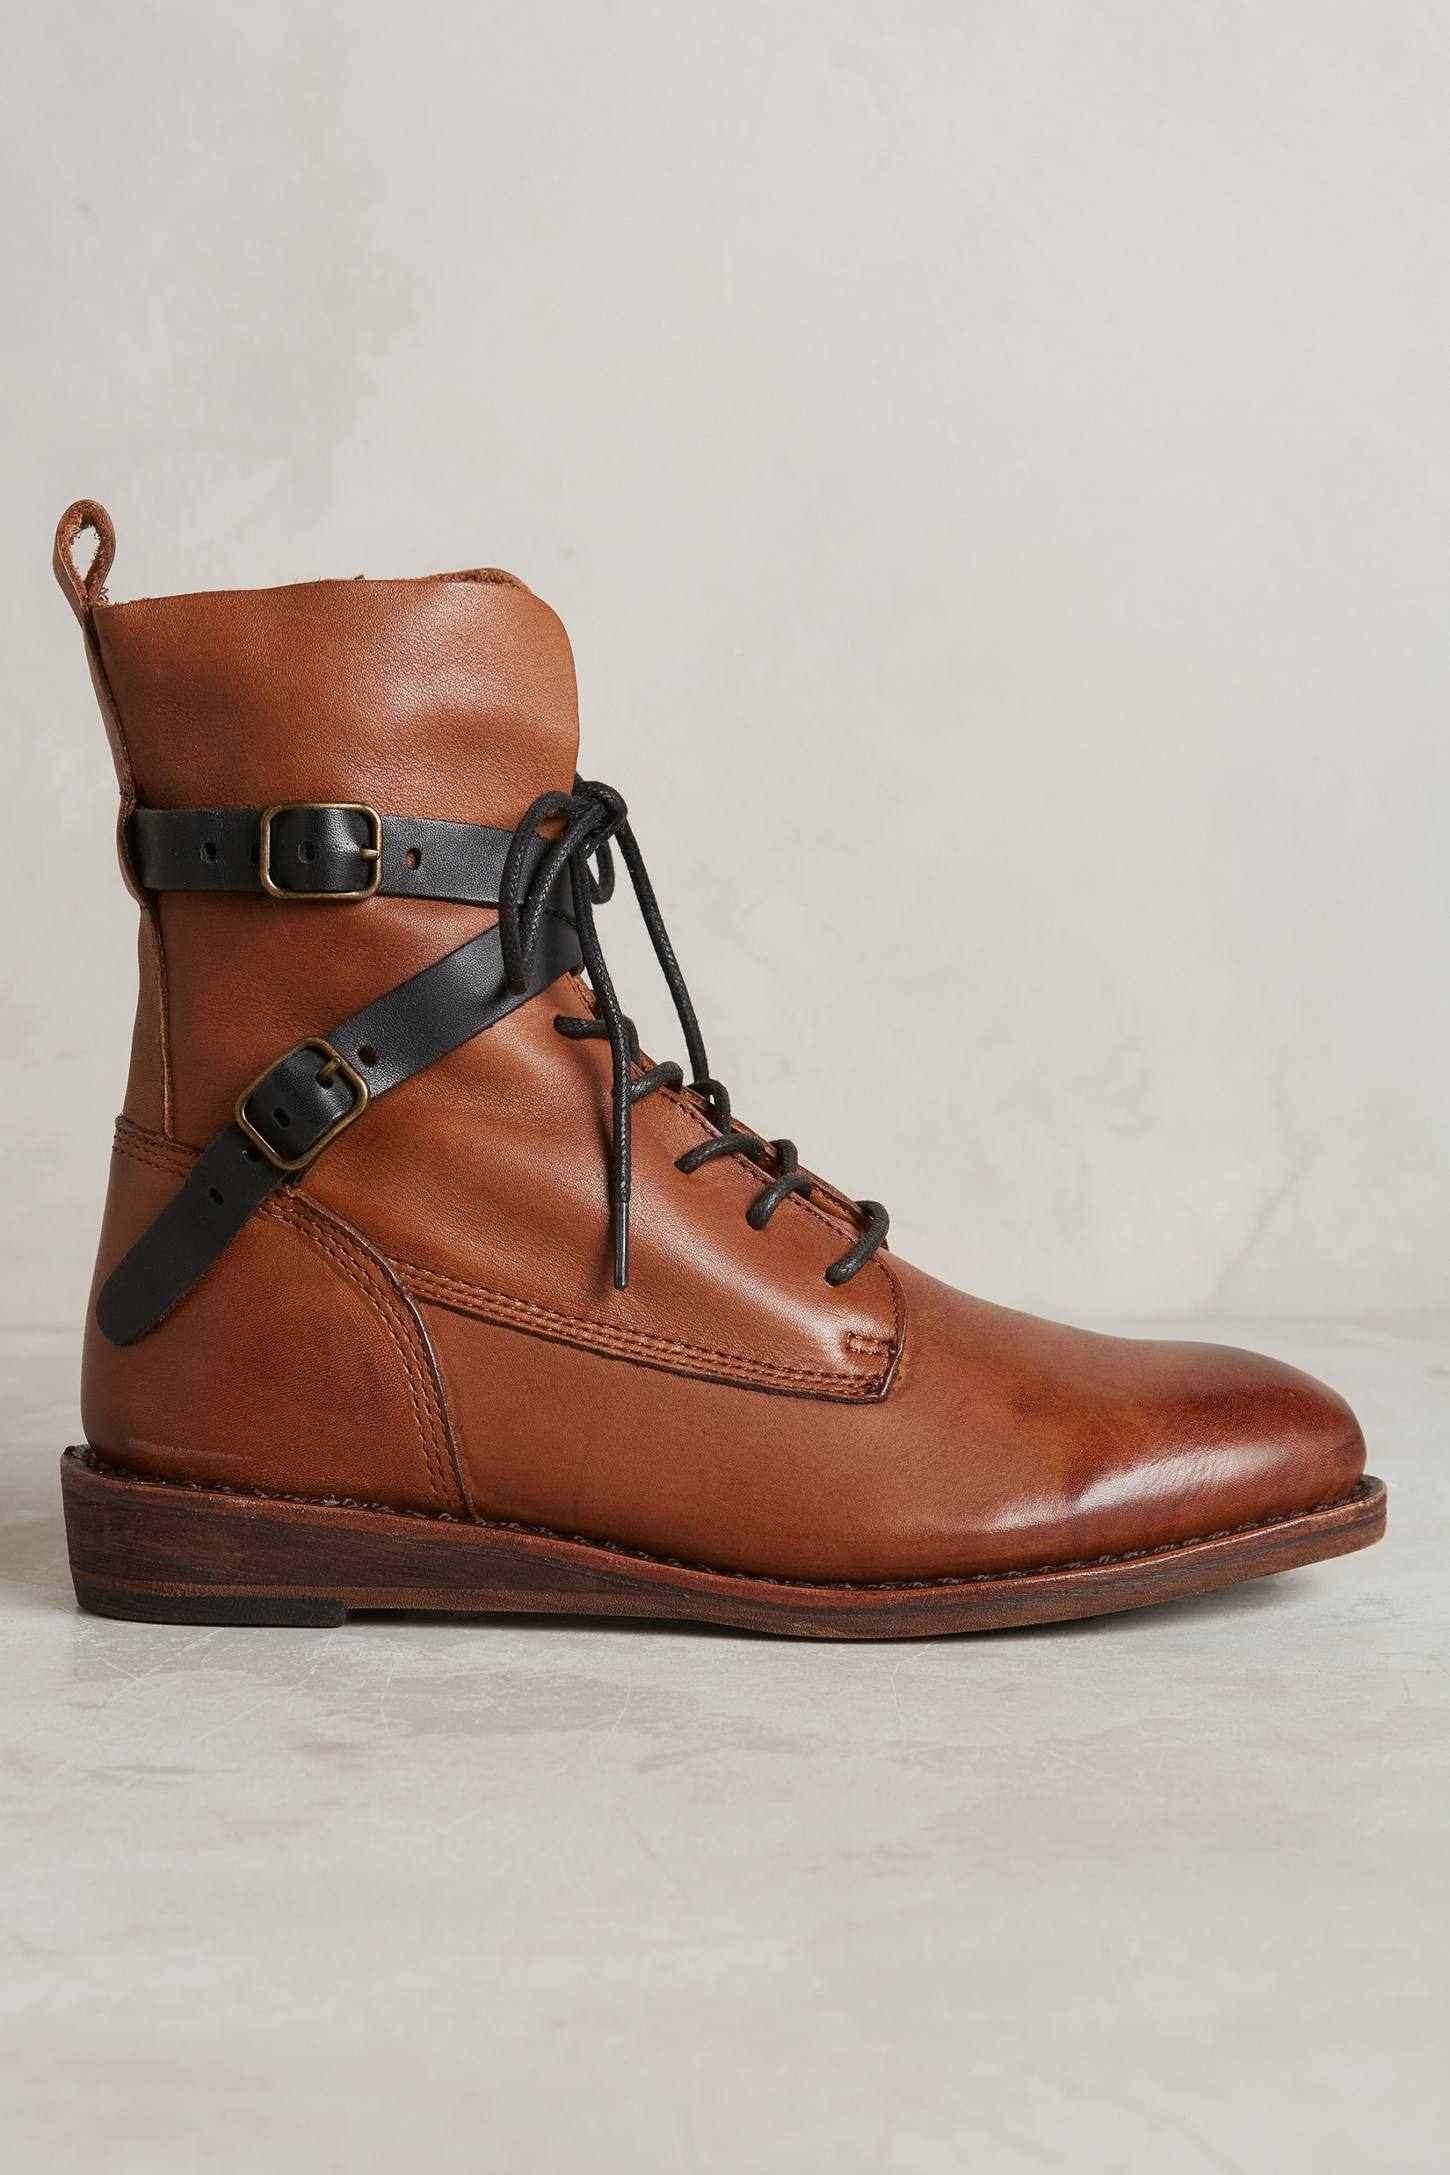 Gee Wawa Casey Boots